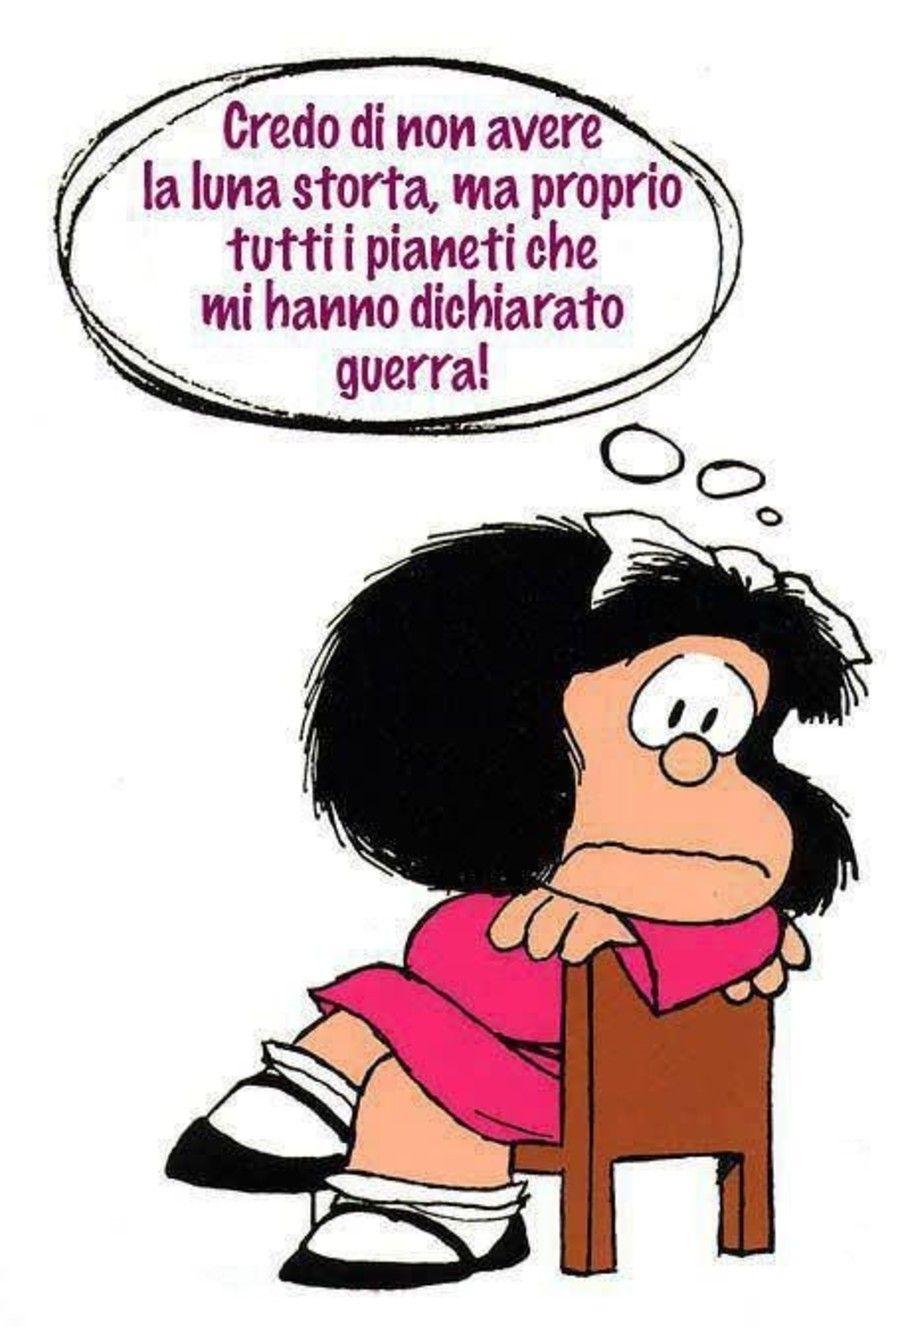 Belle Frasi Divertenti Mafalda Citazioni Divertenti Citazioni